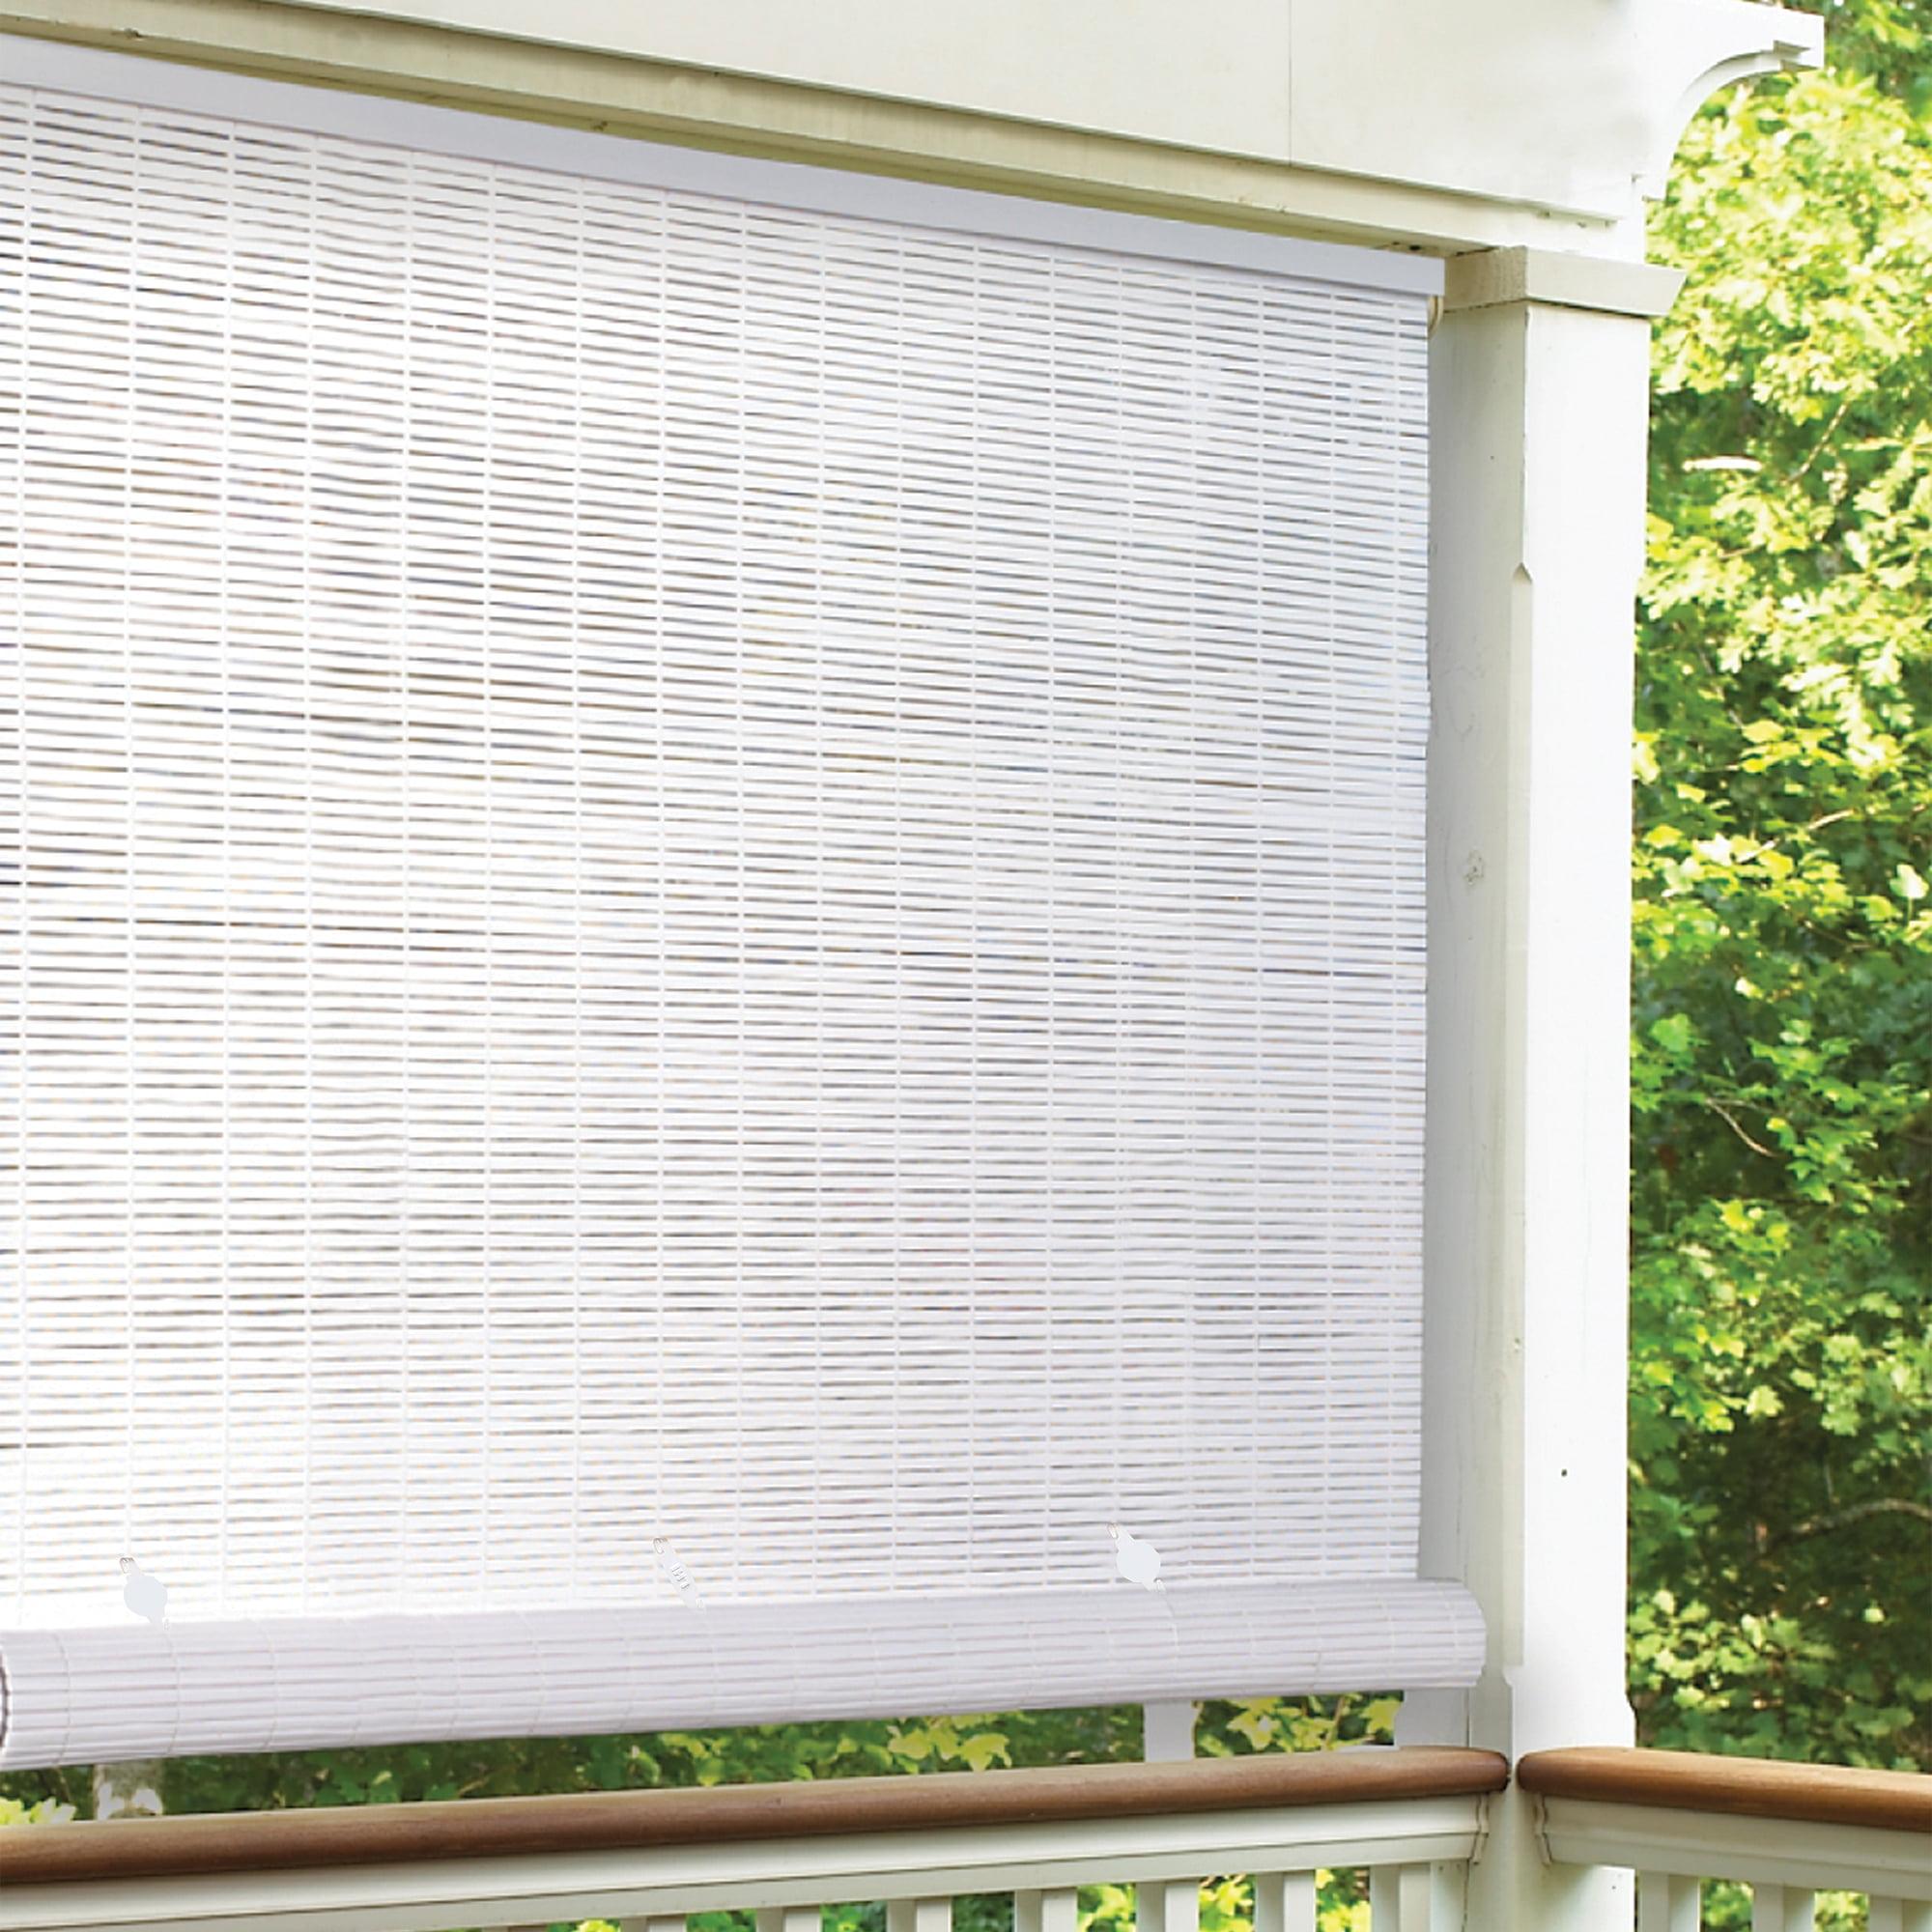 Radiance 4 X 6 Cordless 1 4 Pvc Roll Up Outdoor Sun Shade White Walmart Com Walmart Com